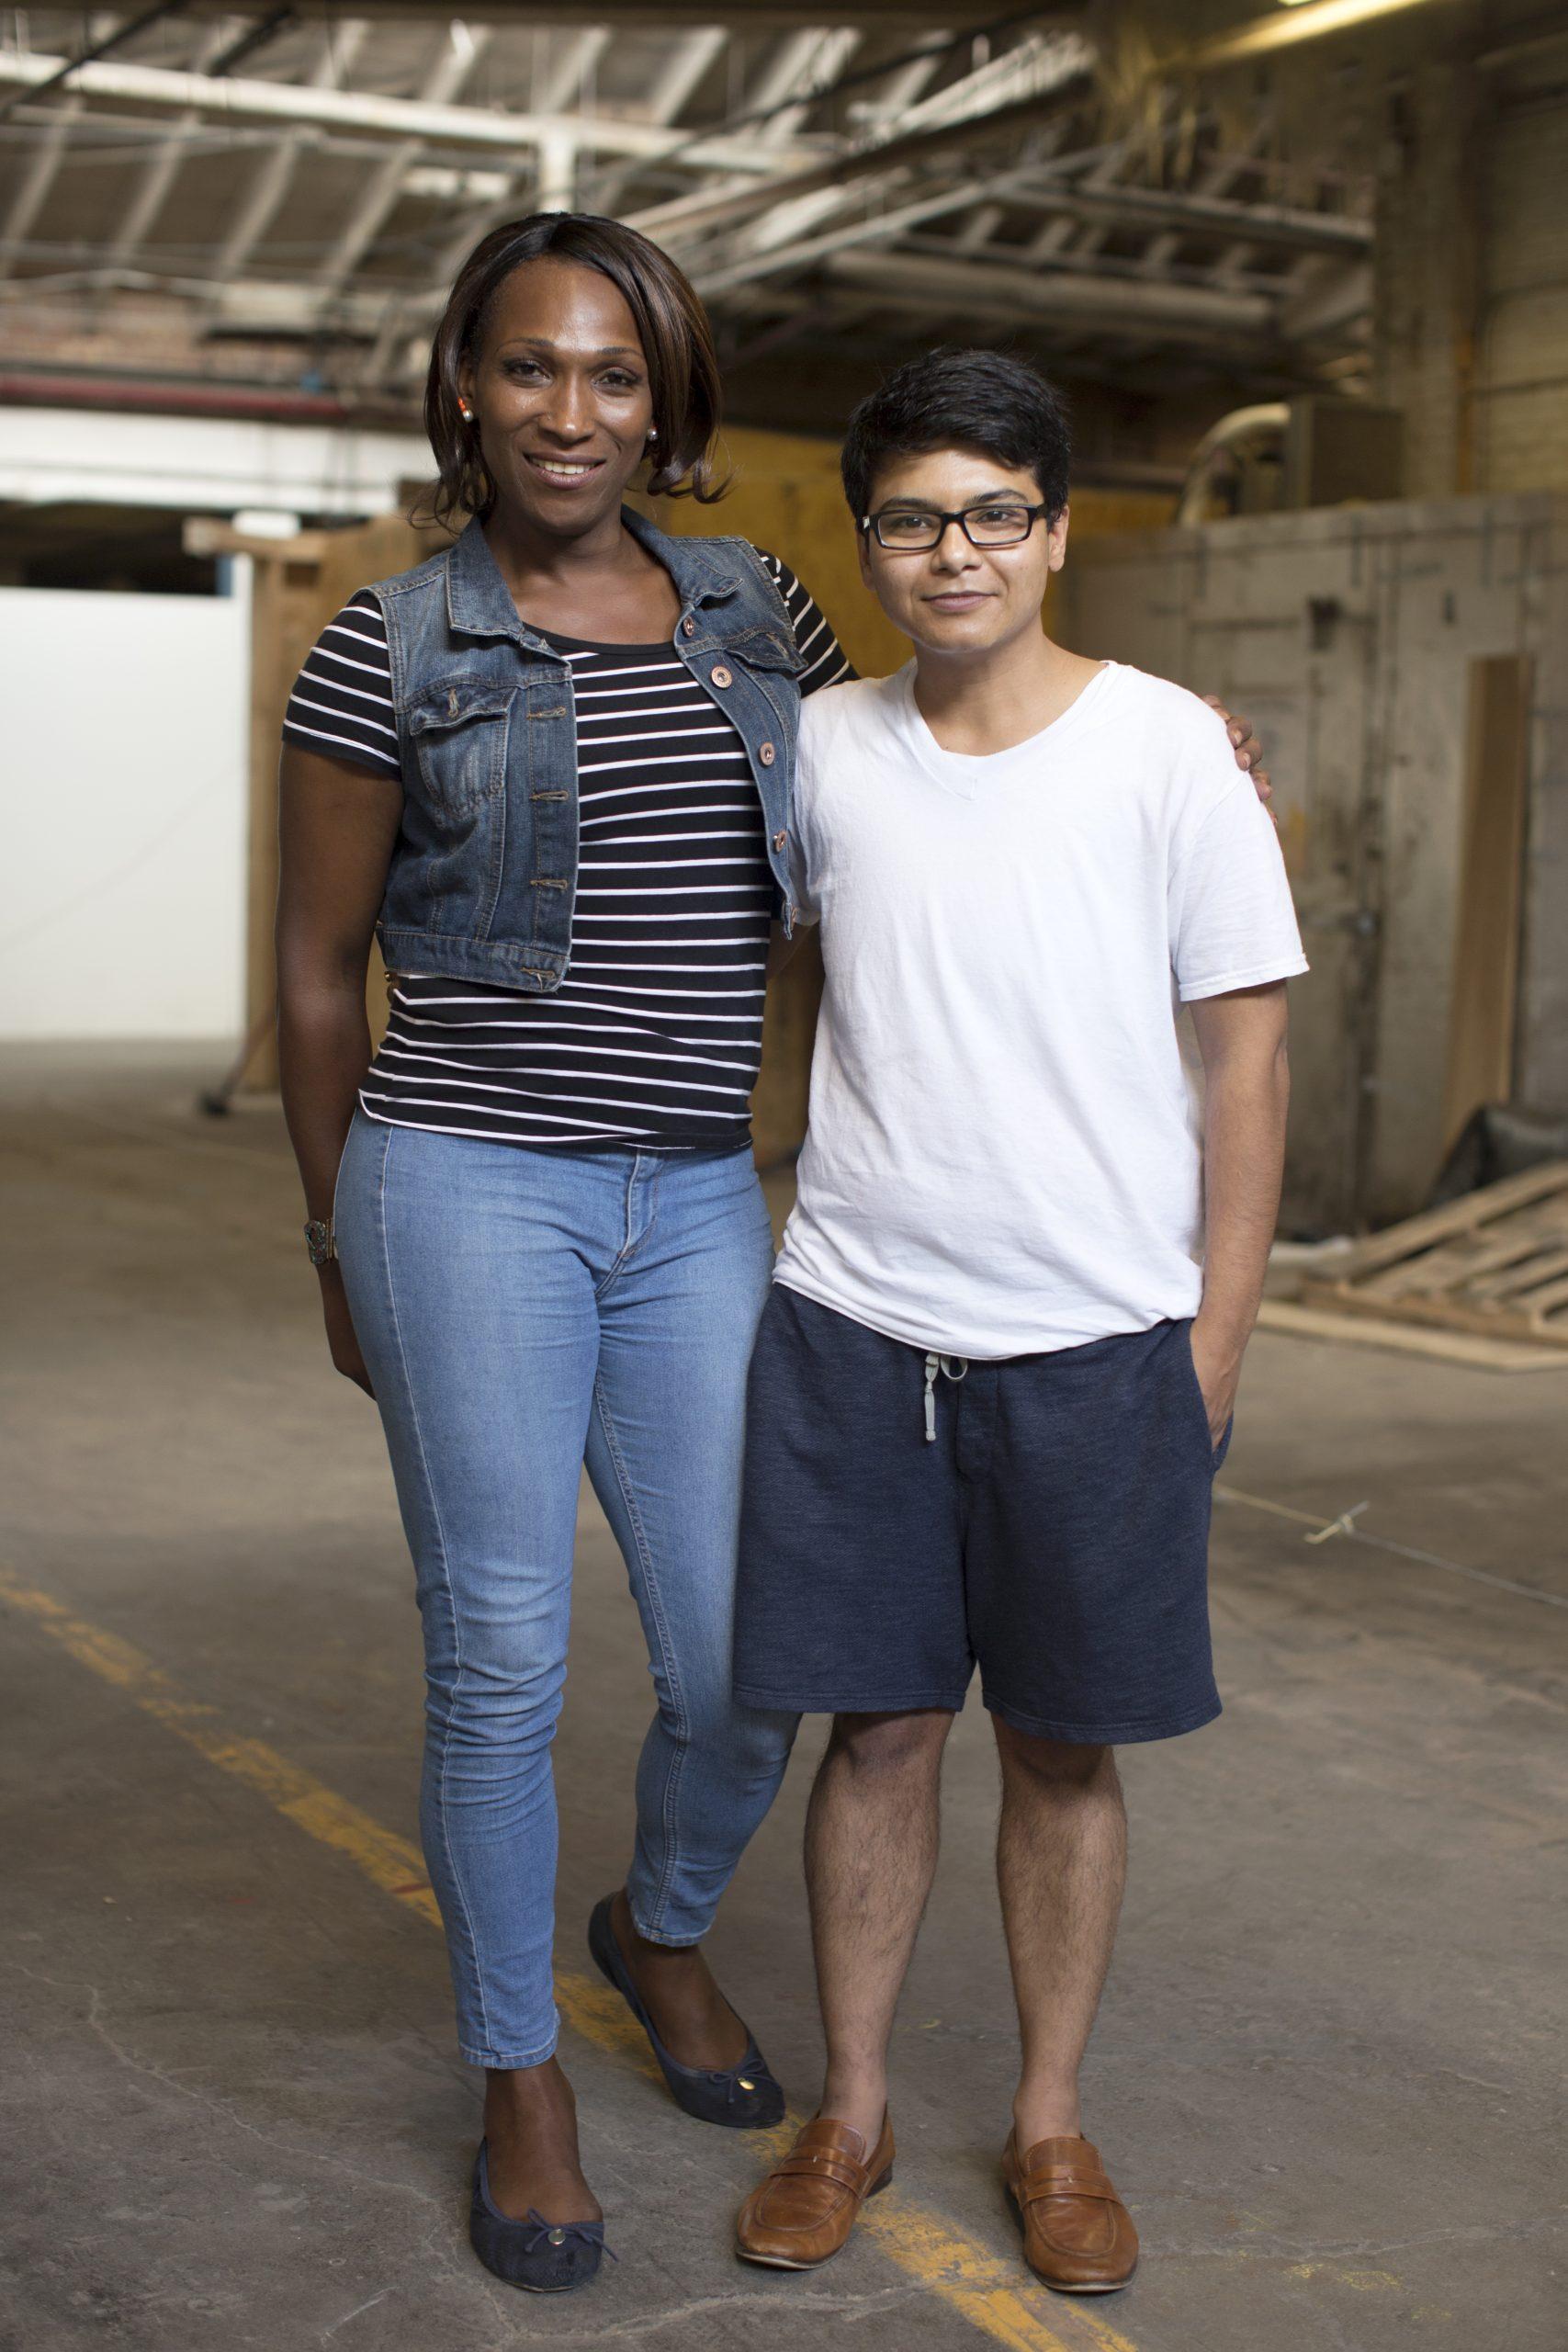 Monica James and Tanvi Sheth